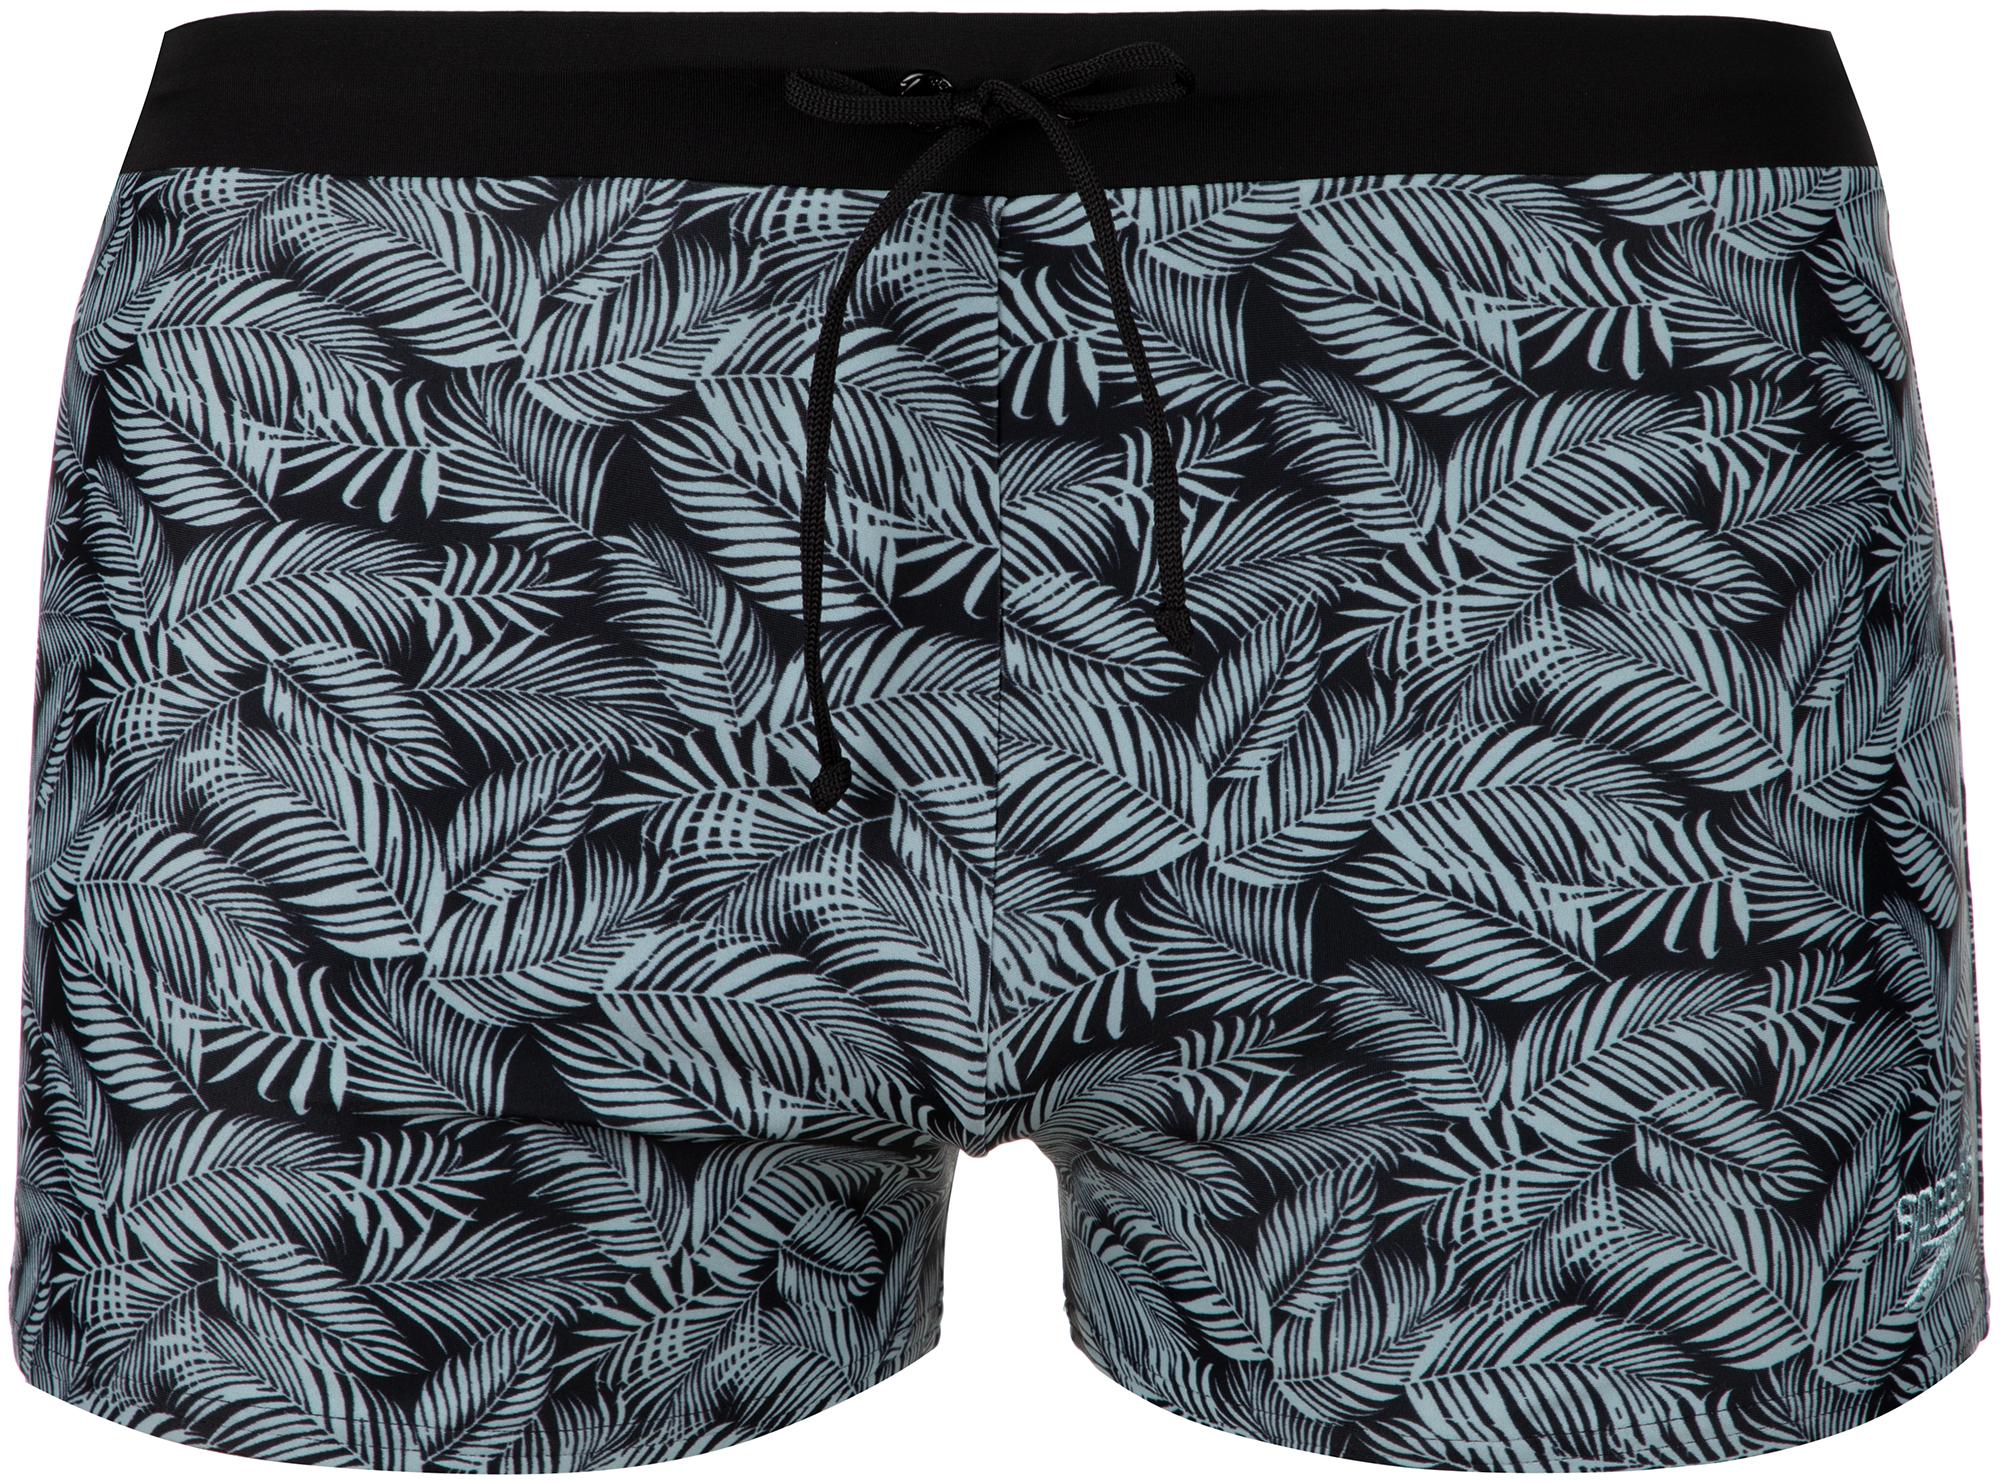 Speedo Плавки-шорты мужские Speedo Valmilton, размер 48-50 speedo плавки шорты мужские speedo tech logo размер 48 50